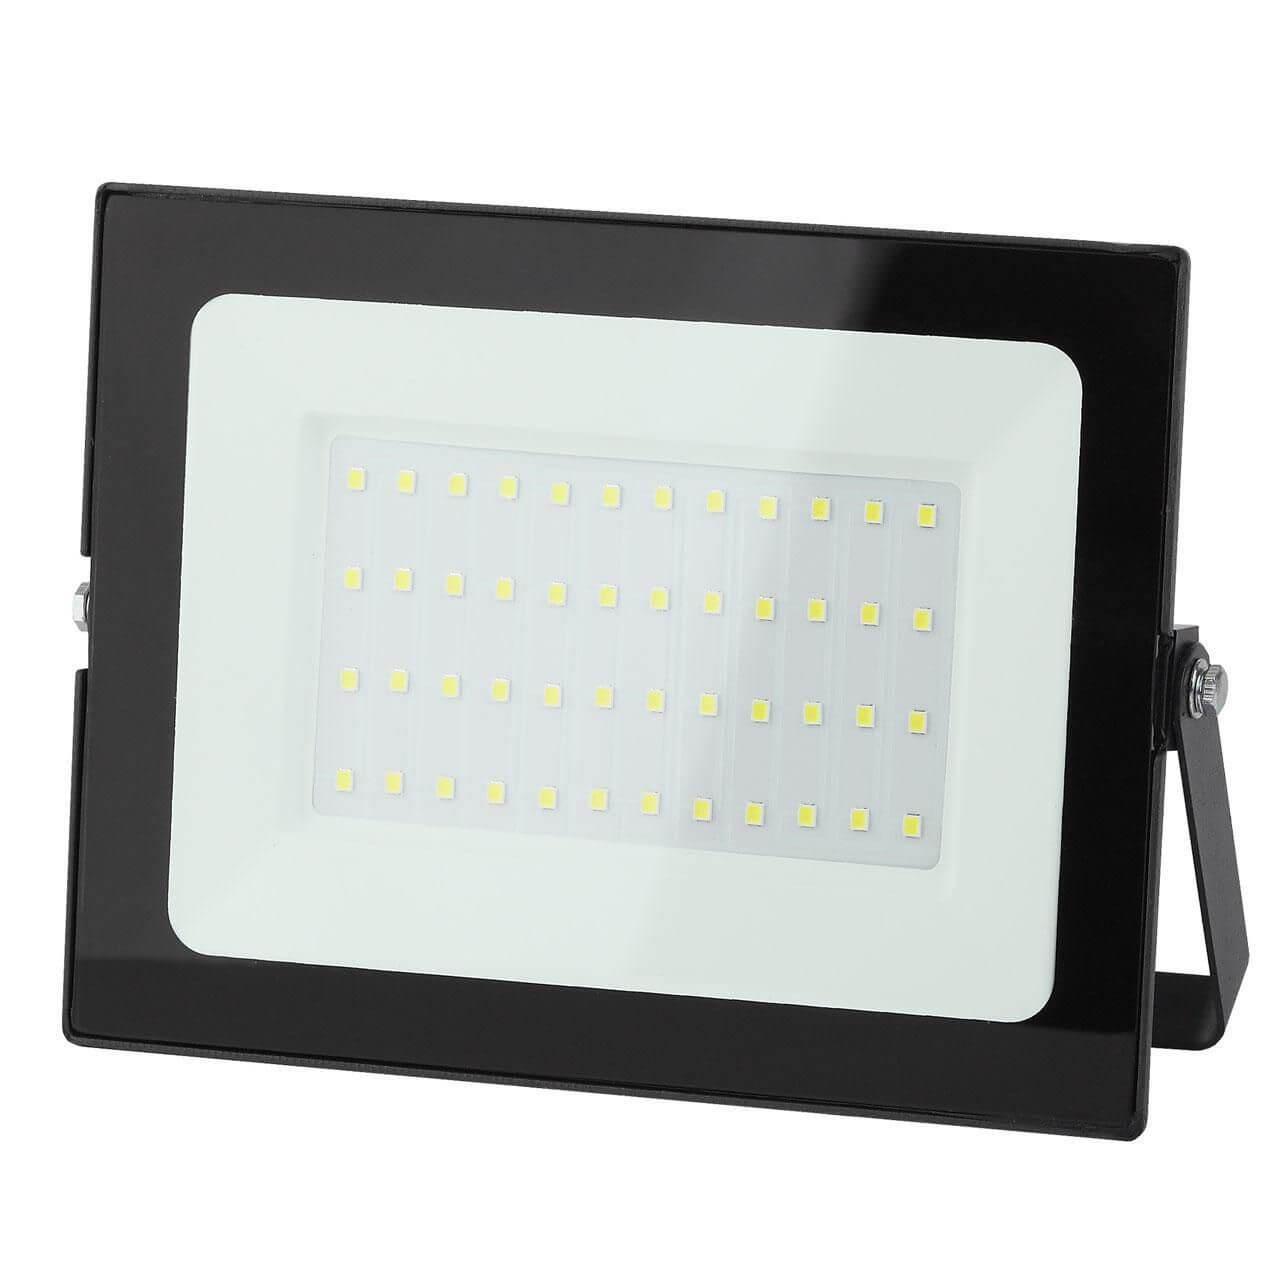 Прожектор ЭРА LPR-021-0-30K-050 LPR-021